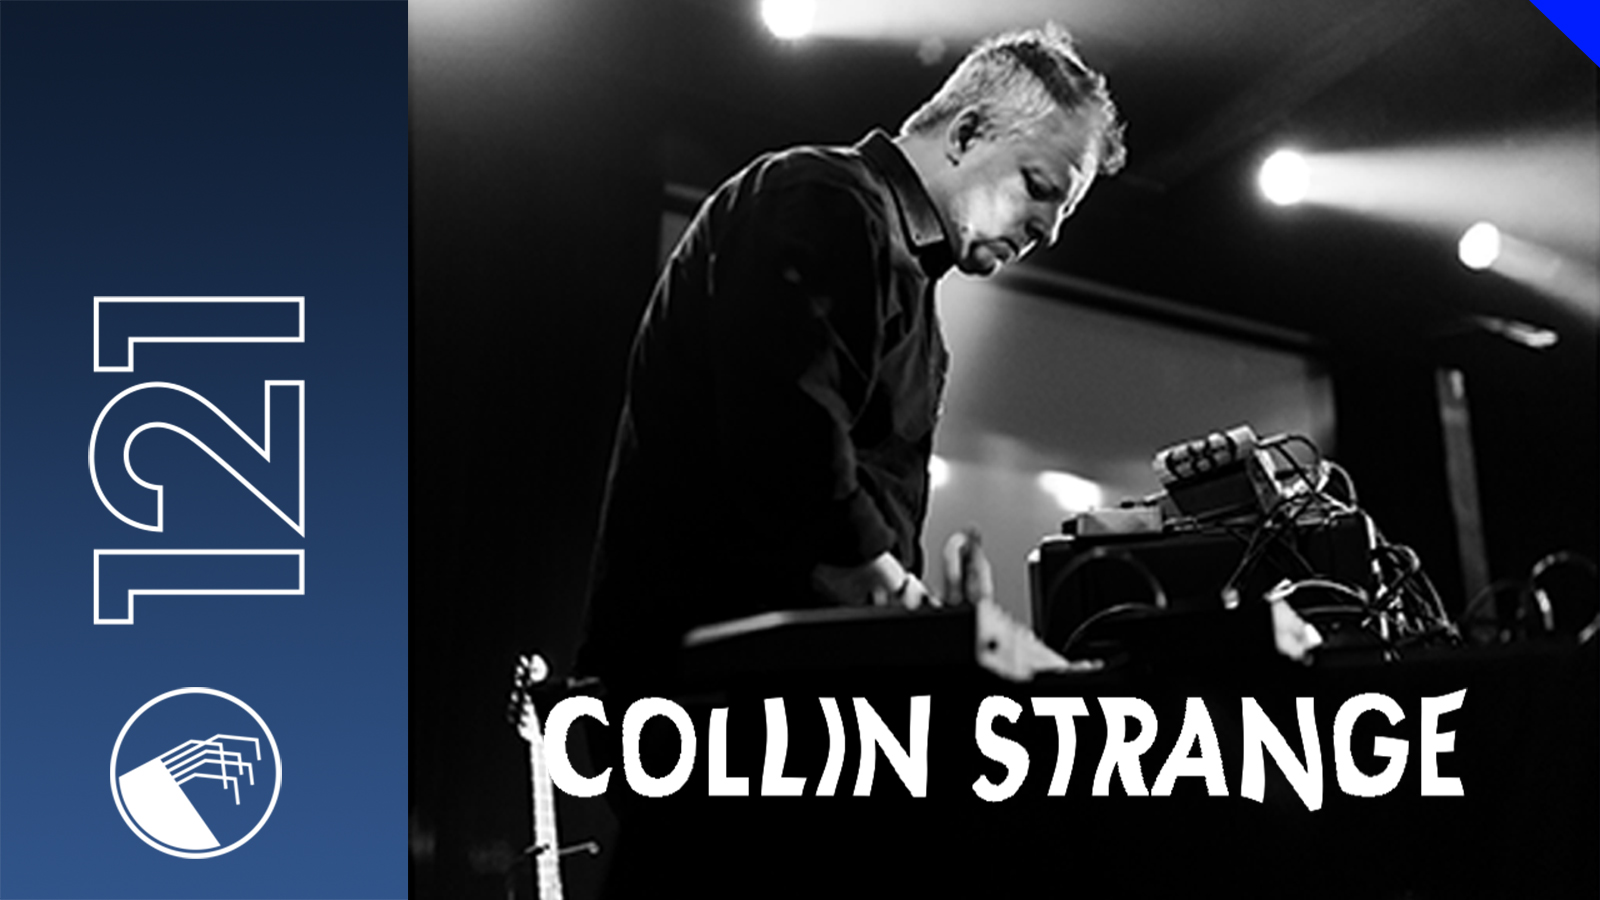 121 Collin Strange